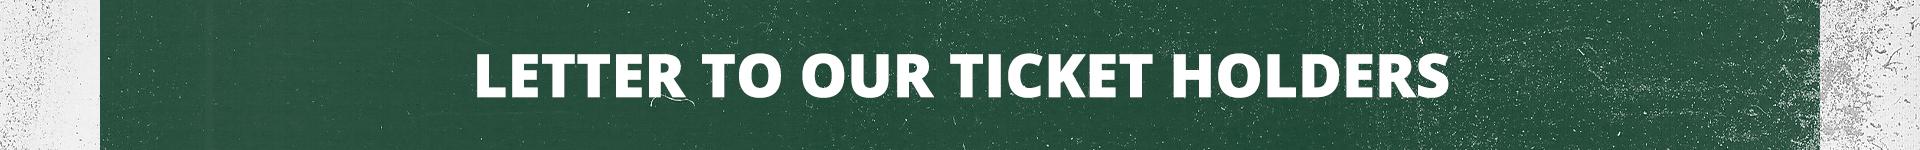 TicketLandingPage_02